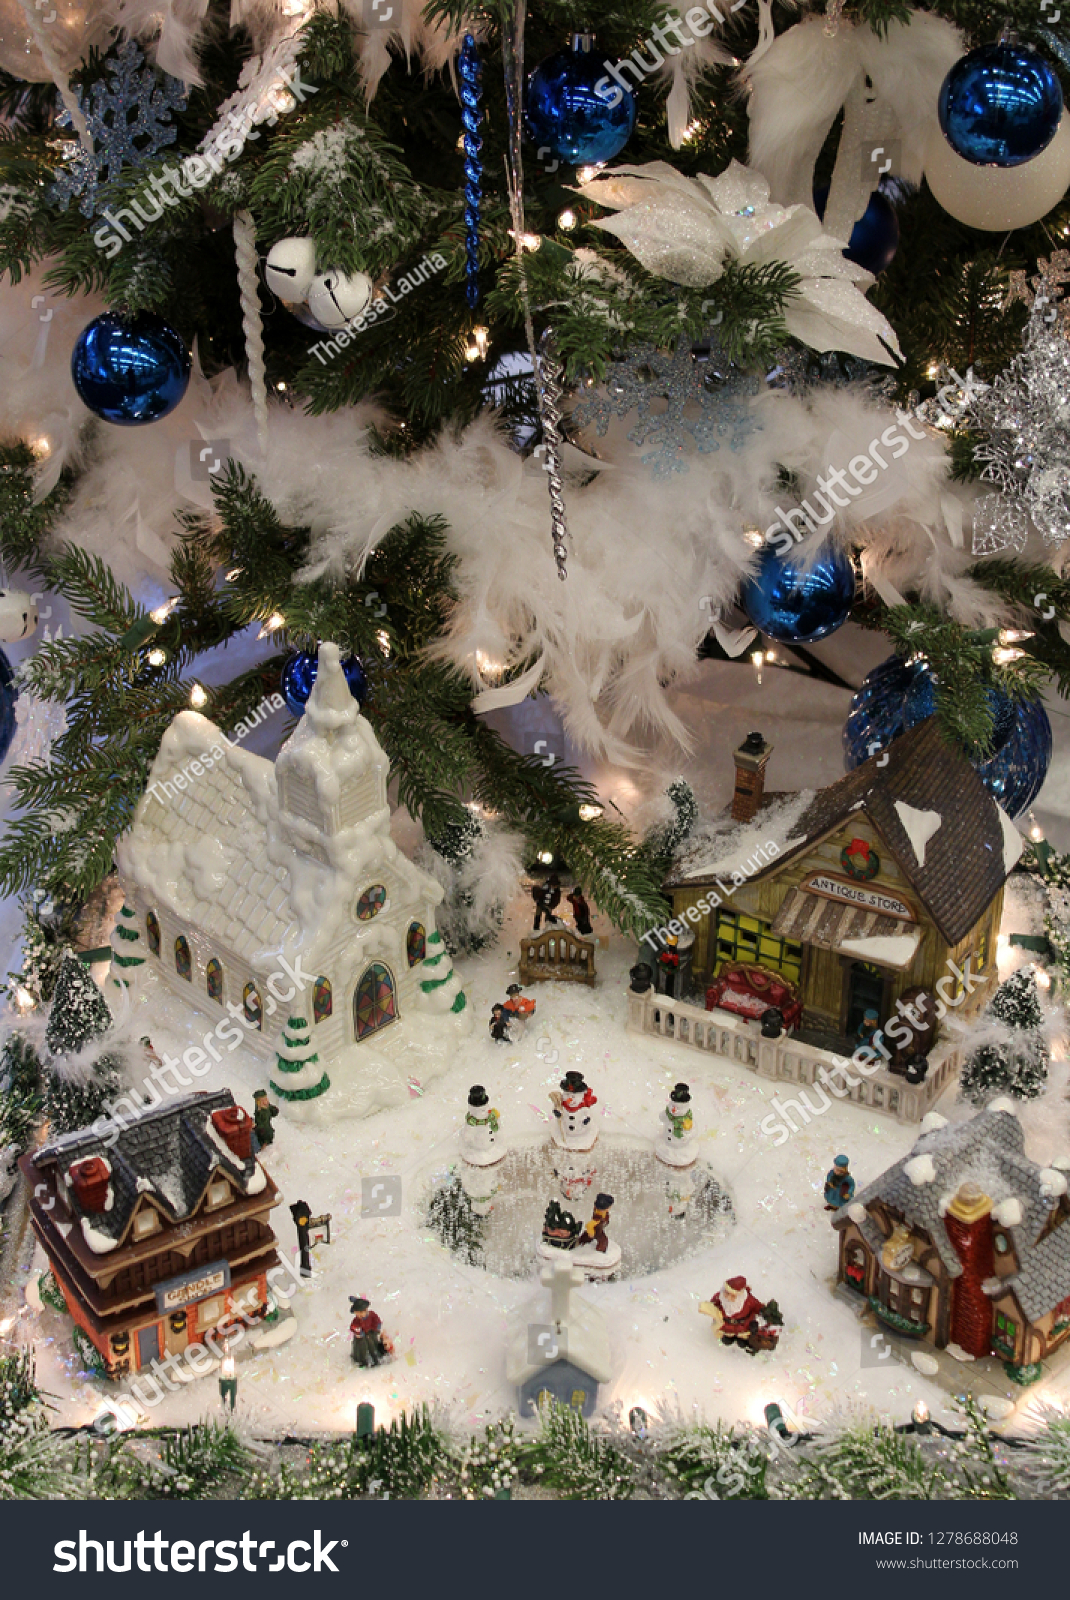 Traditional Christmas Village Snow Scene People Holidays Stock Image 1278688048